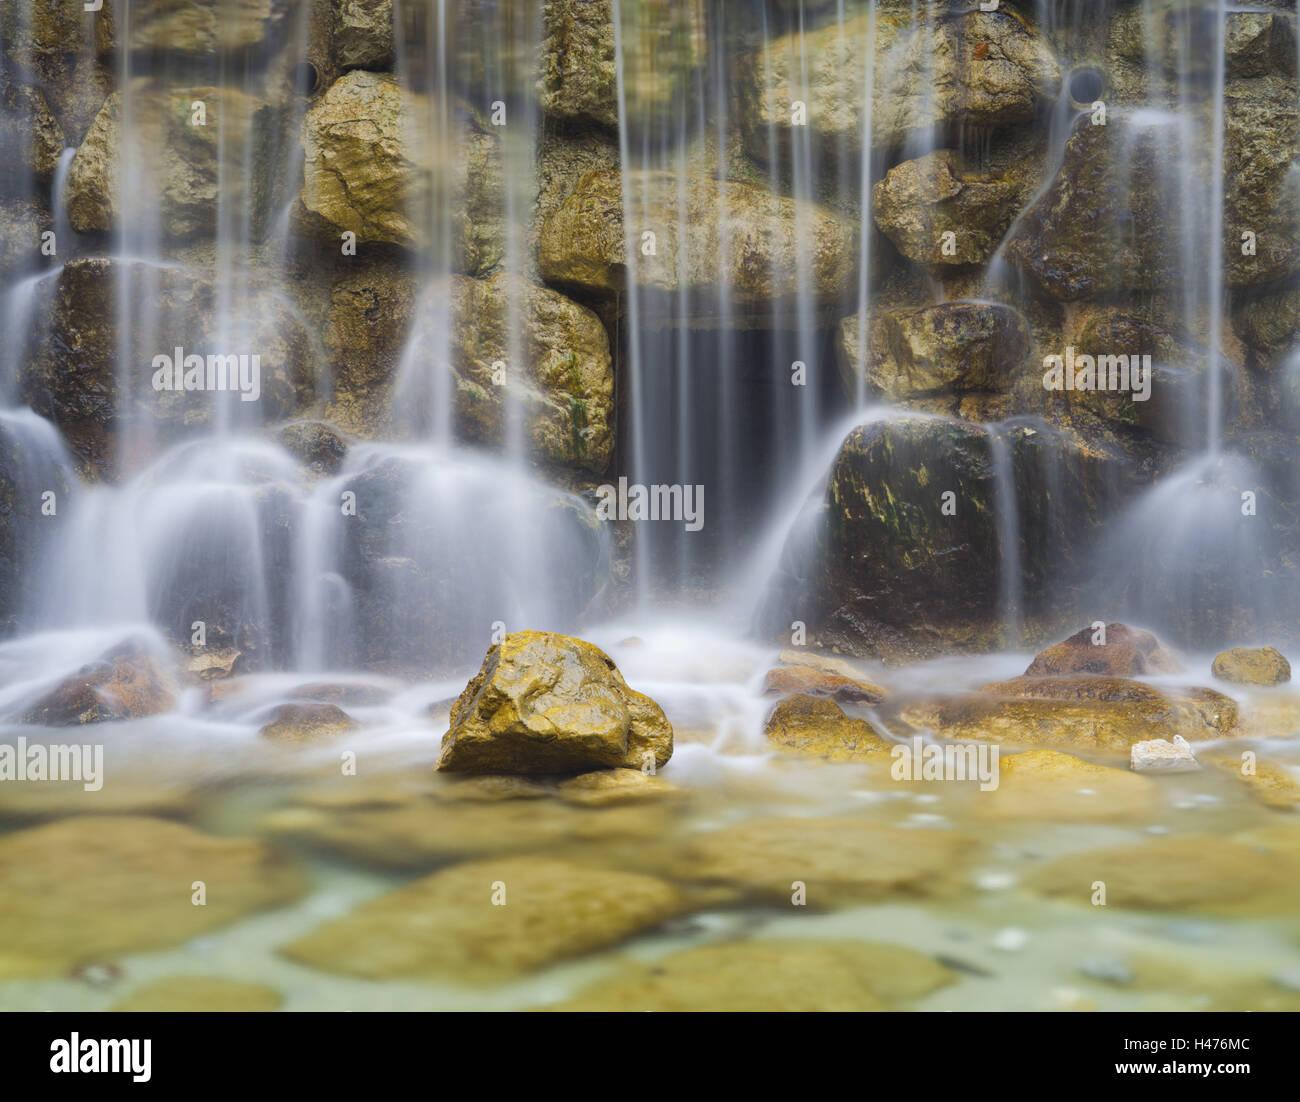 Germany Bavaria Ammergebirge Allgau Pollat Waterfall Stock Photo Alamy